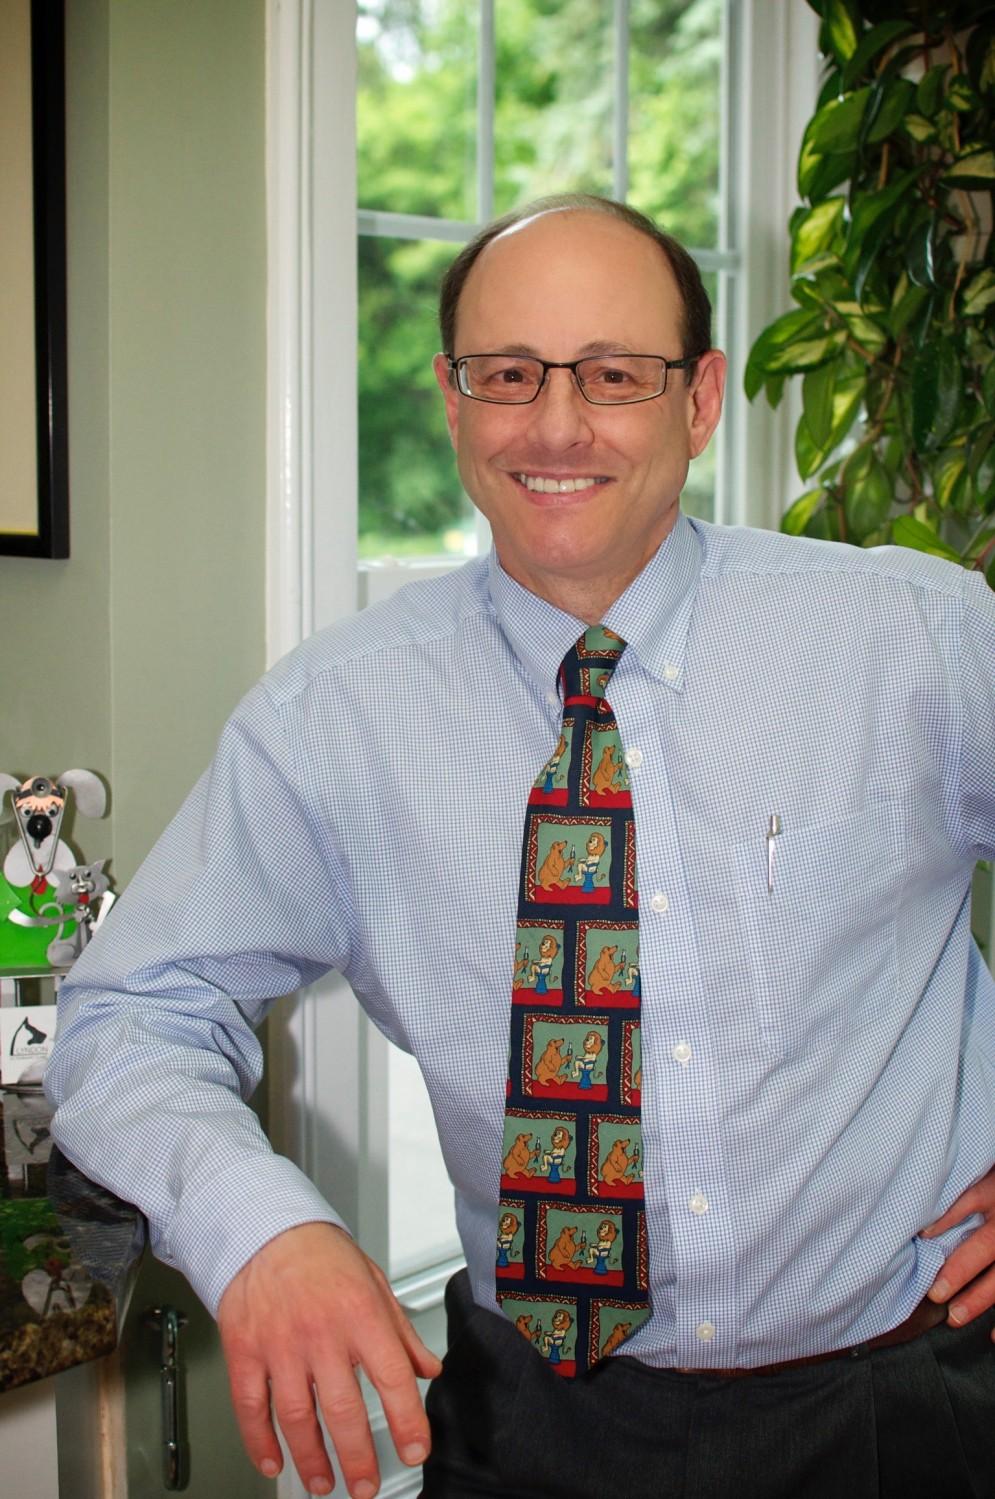 Eric M. Davis, DVM, DAVDC